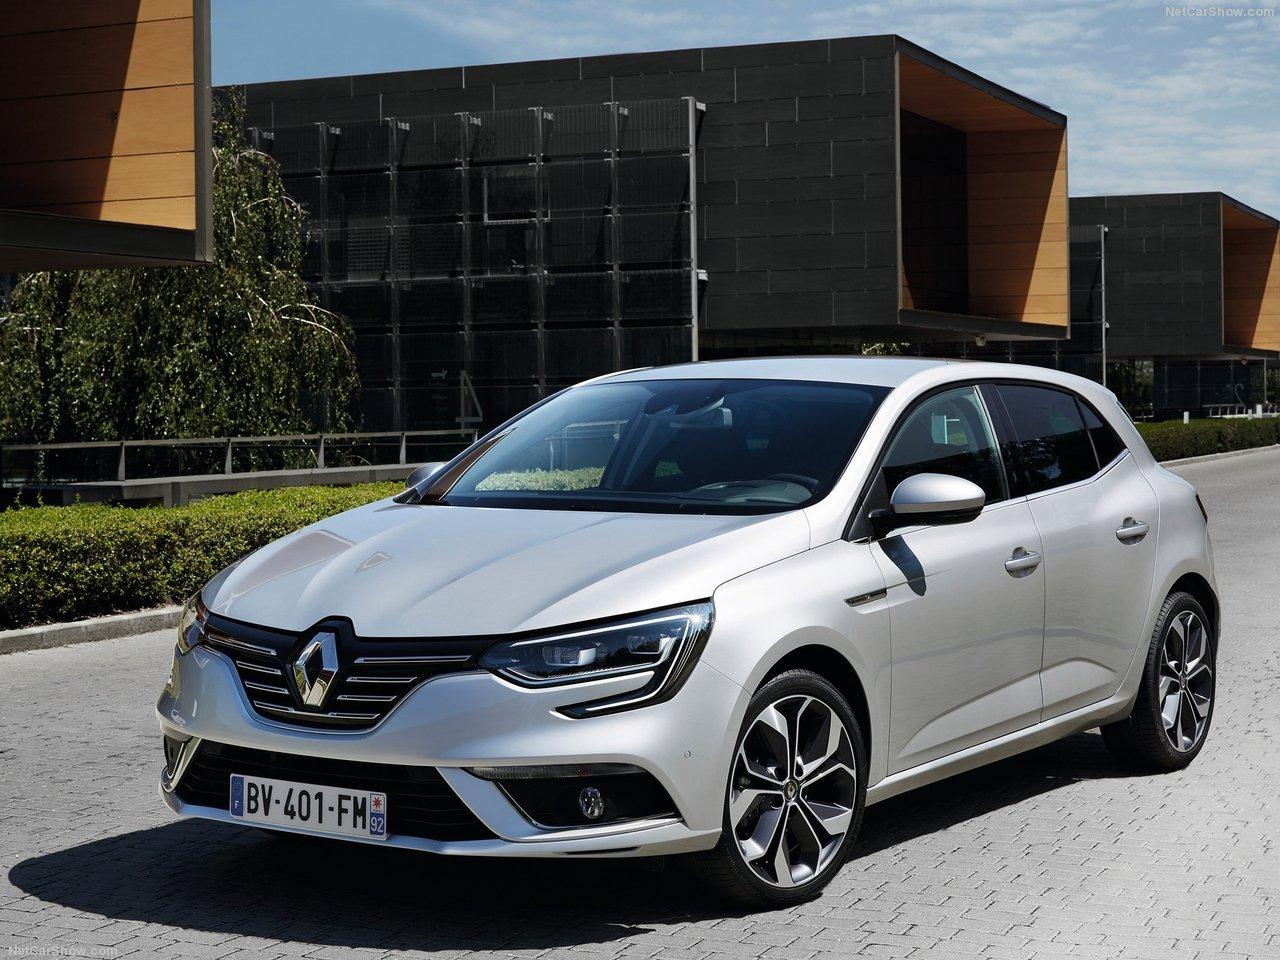 Renault-Megane_2016_1280x960_wallpaper_06